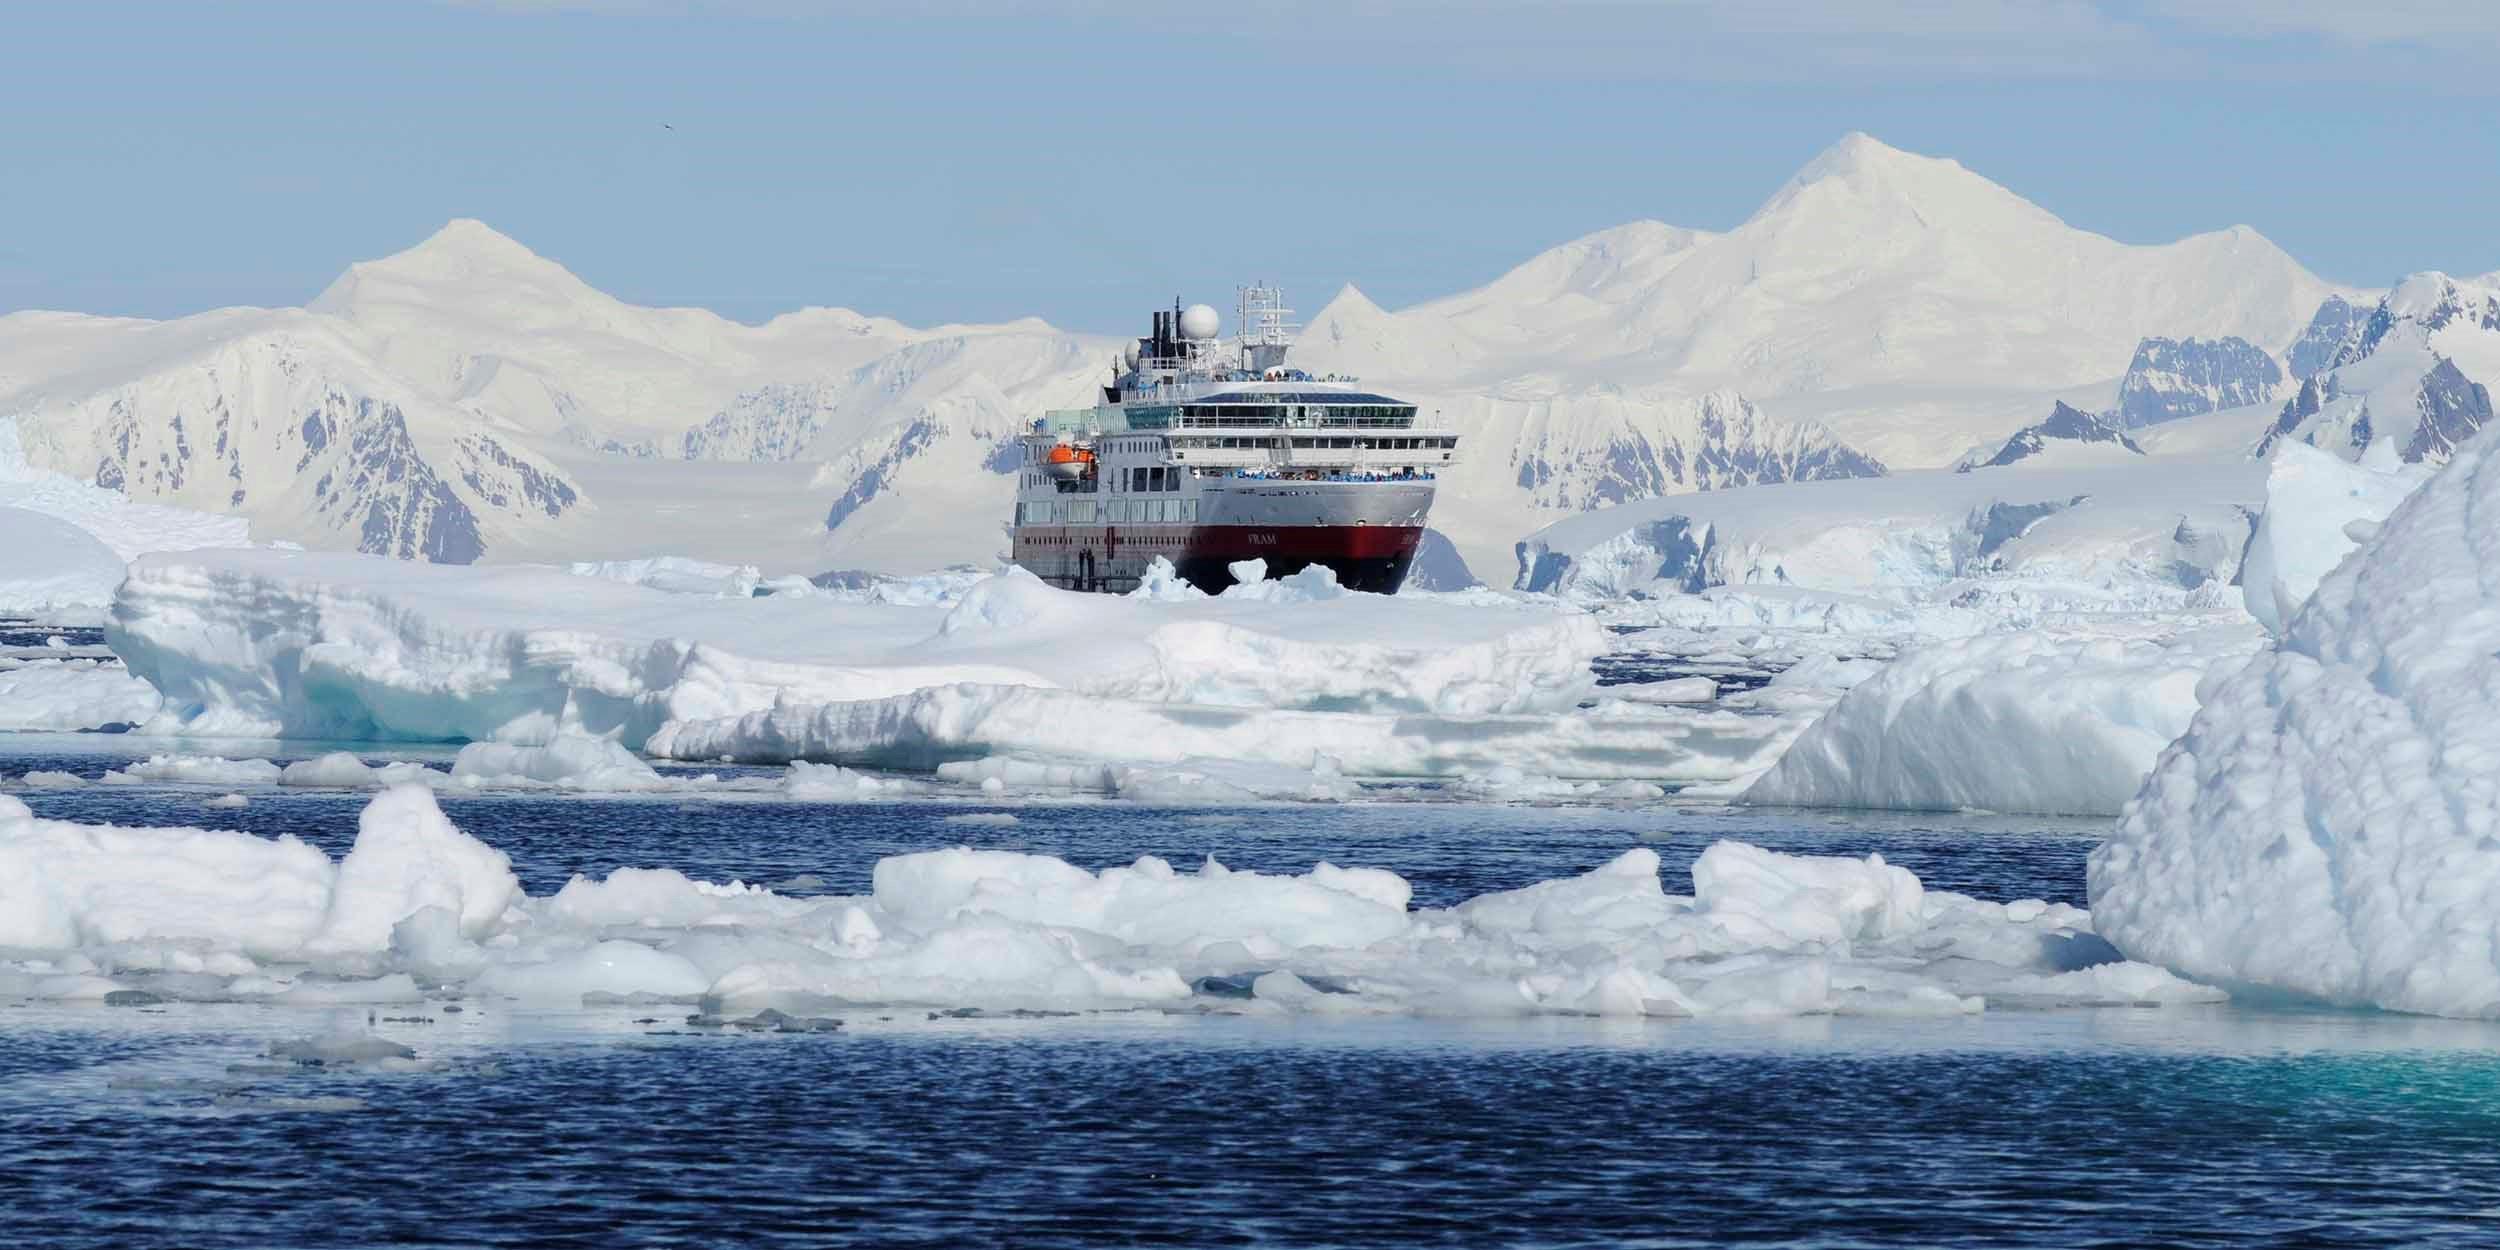 Antarctica, Falklands, South Georgia - The Ultimate Expedition